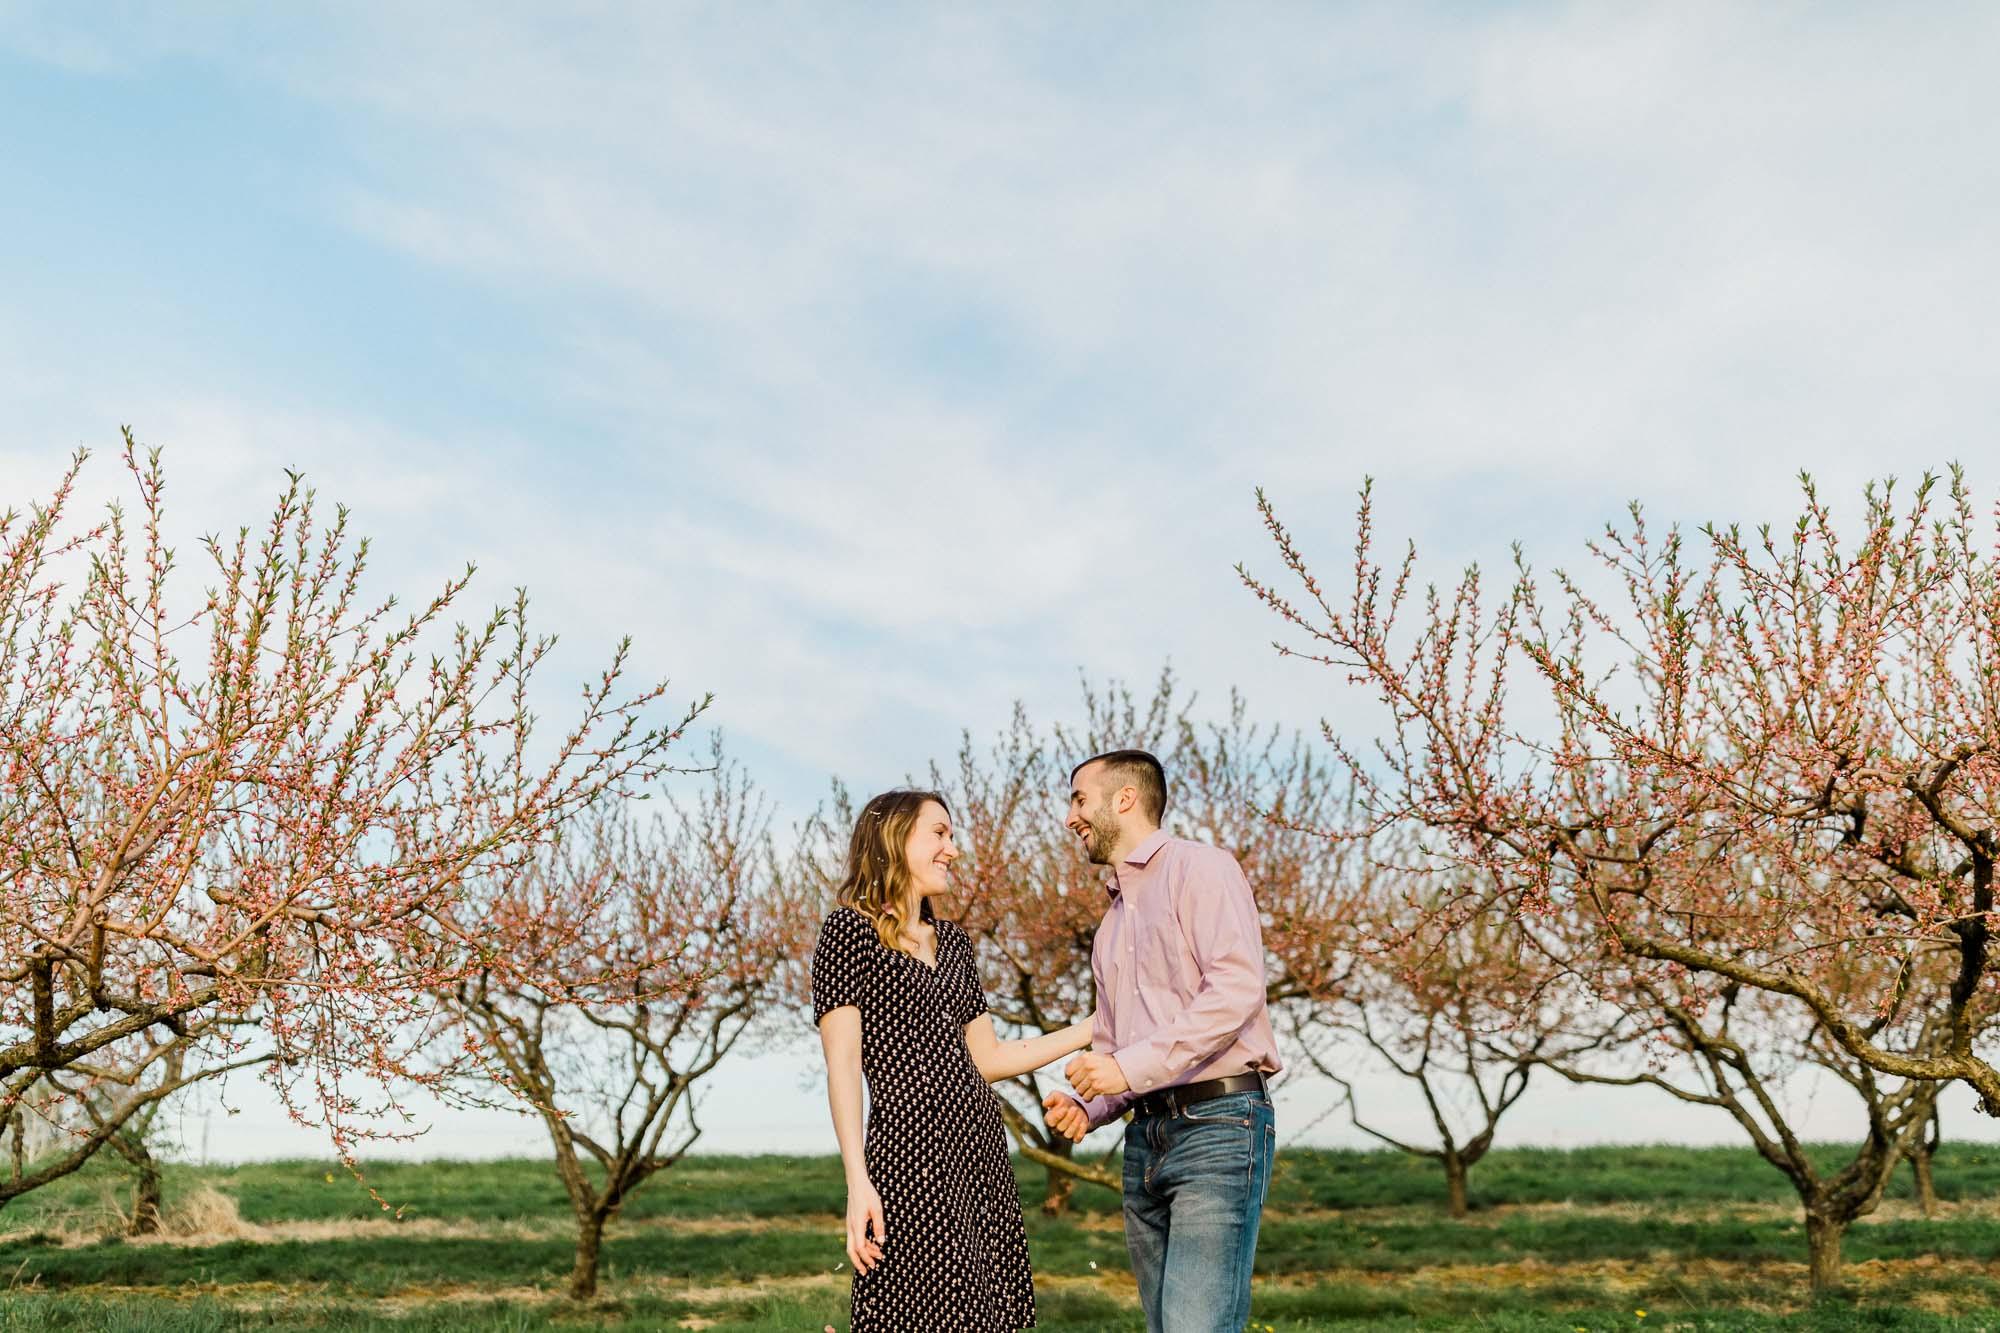 Rohrbachs-Spring-cherry-blossom-engagement-7628.jpg